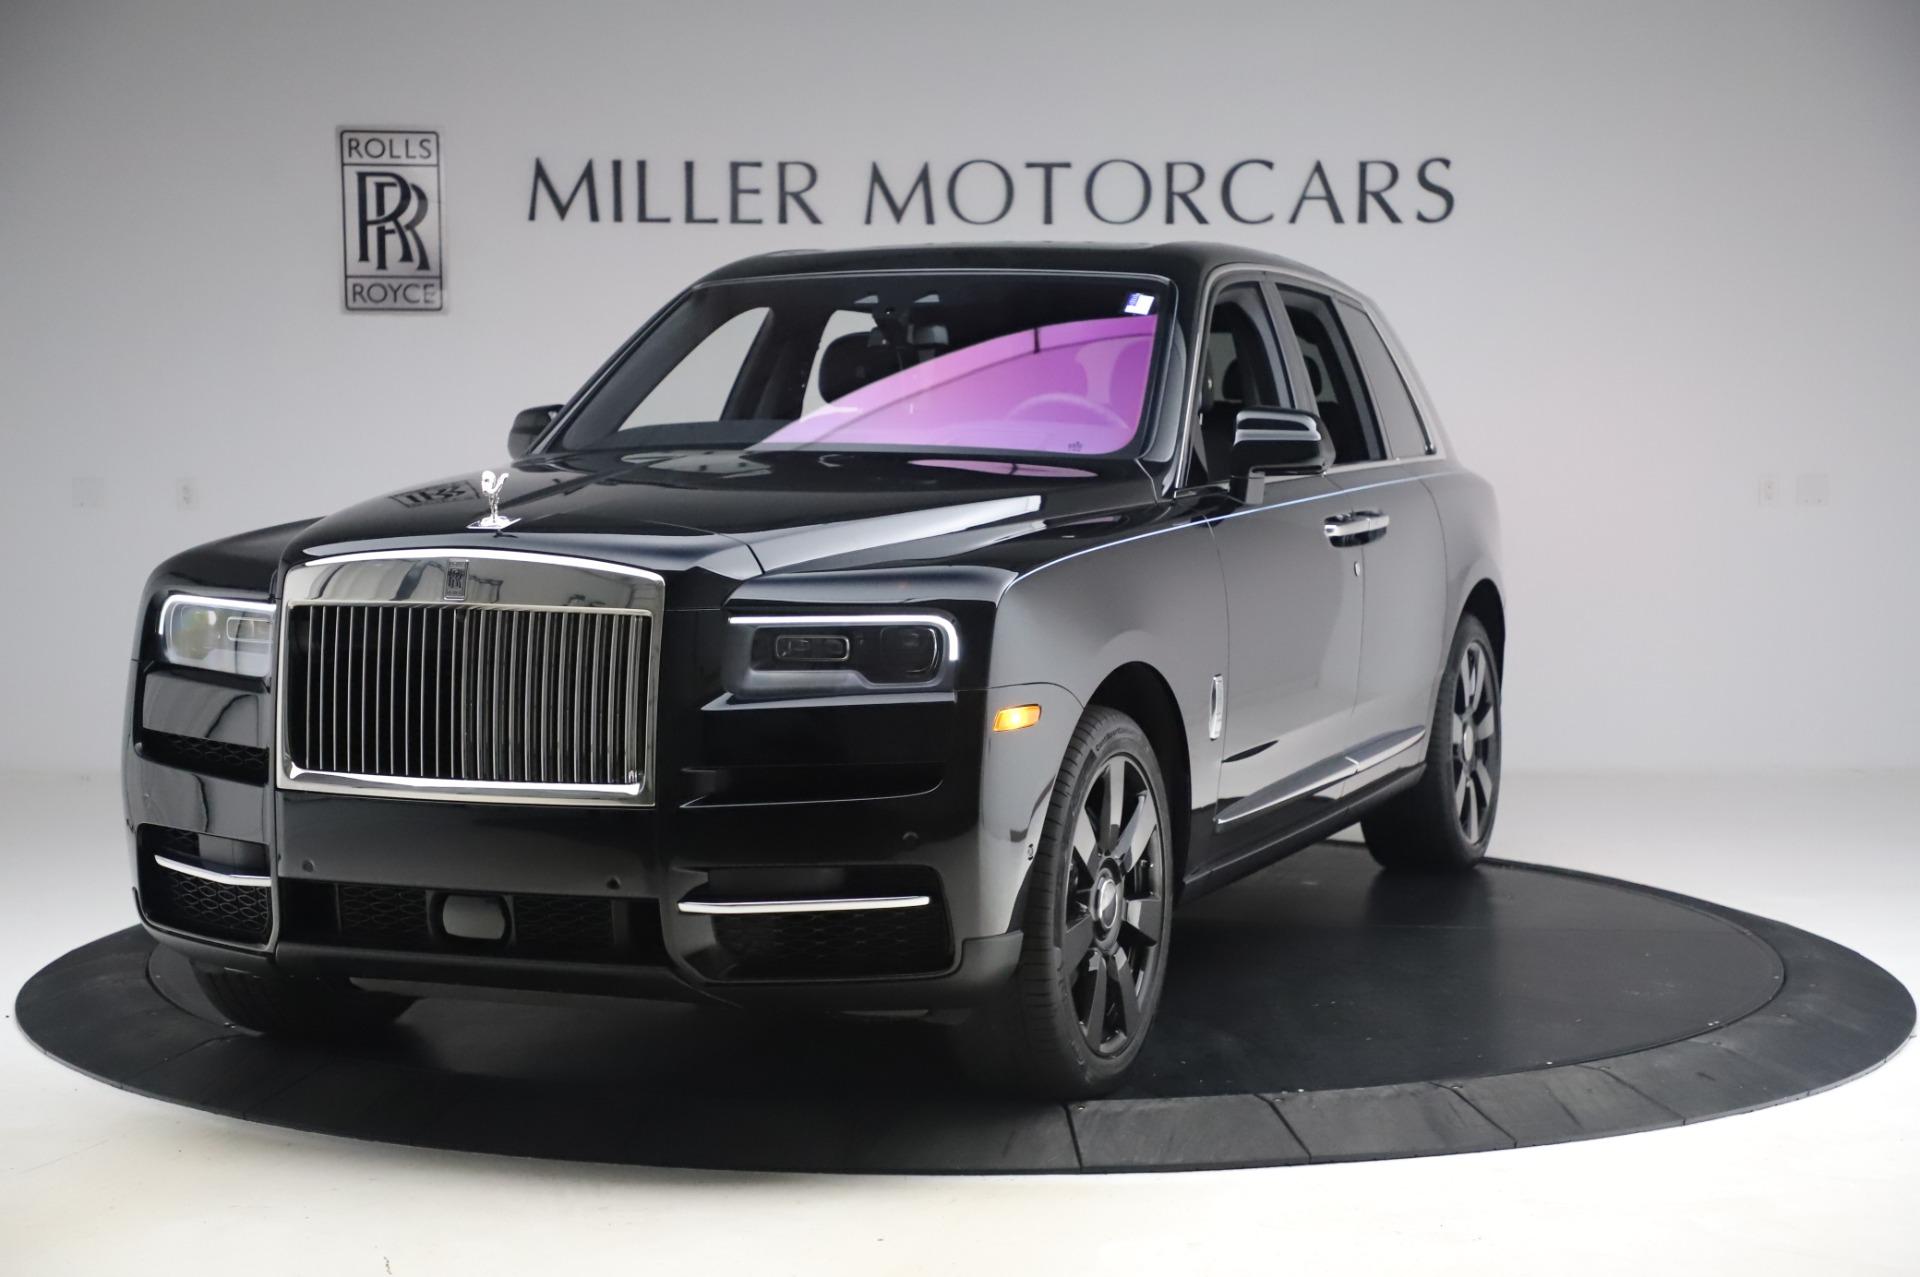 New 2021 Rolls-Royce Cullinan for sale Sold at Rolls-Royce Motor Cars Greenwich in Greenwich CT 06830 1